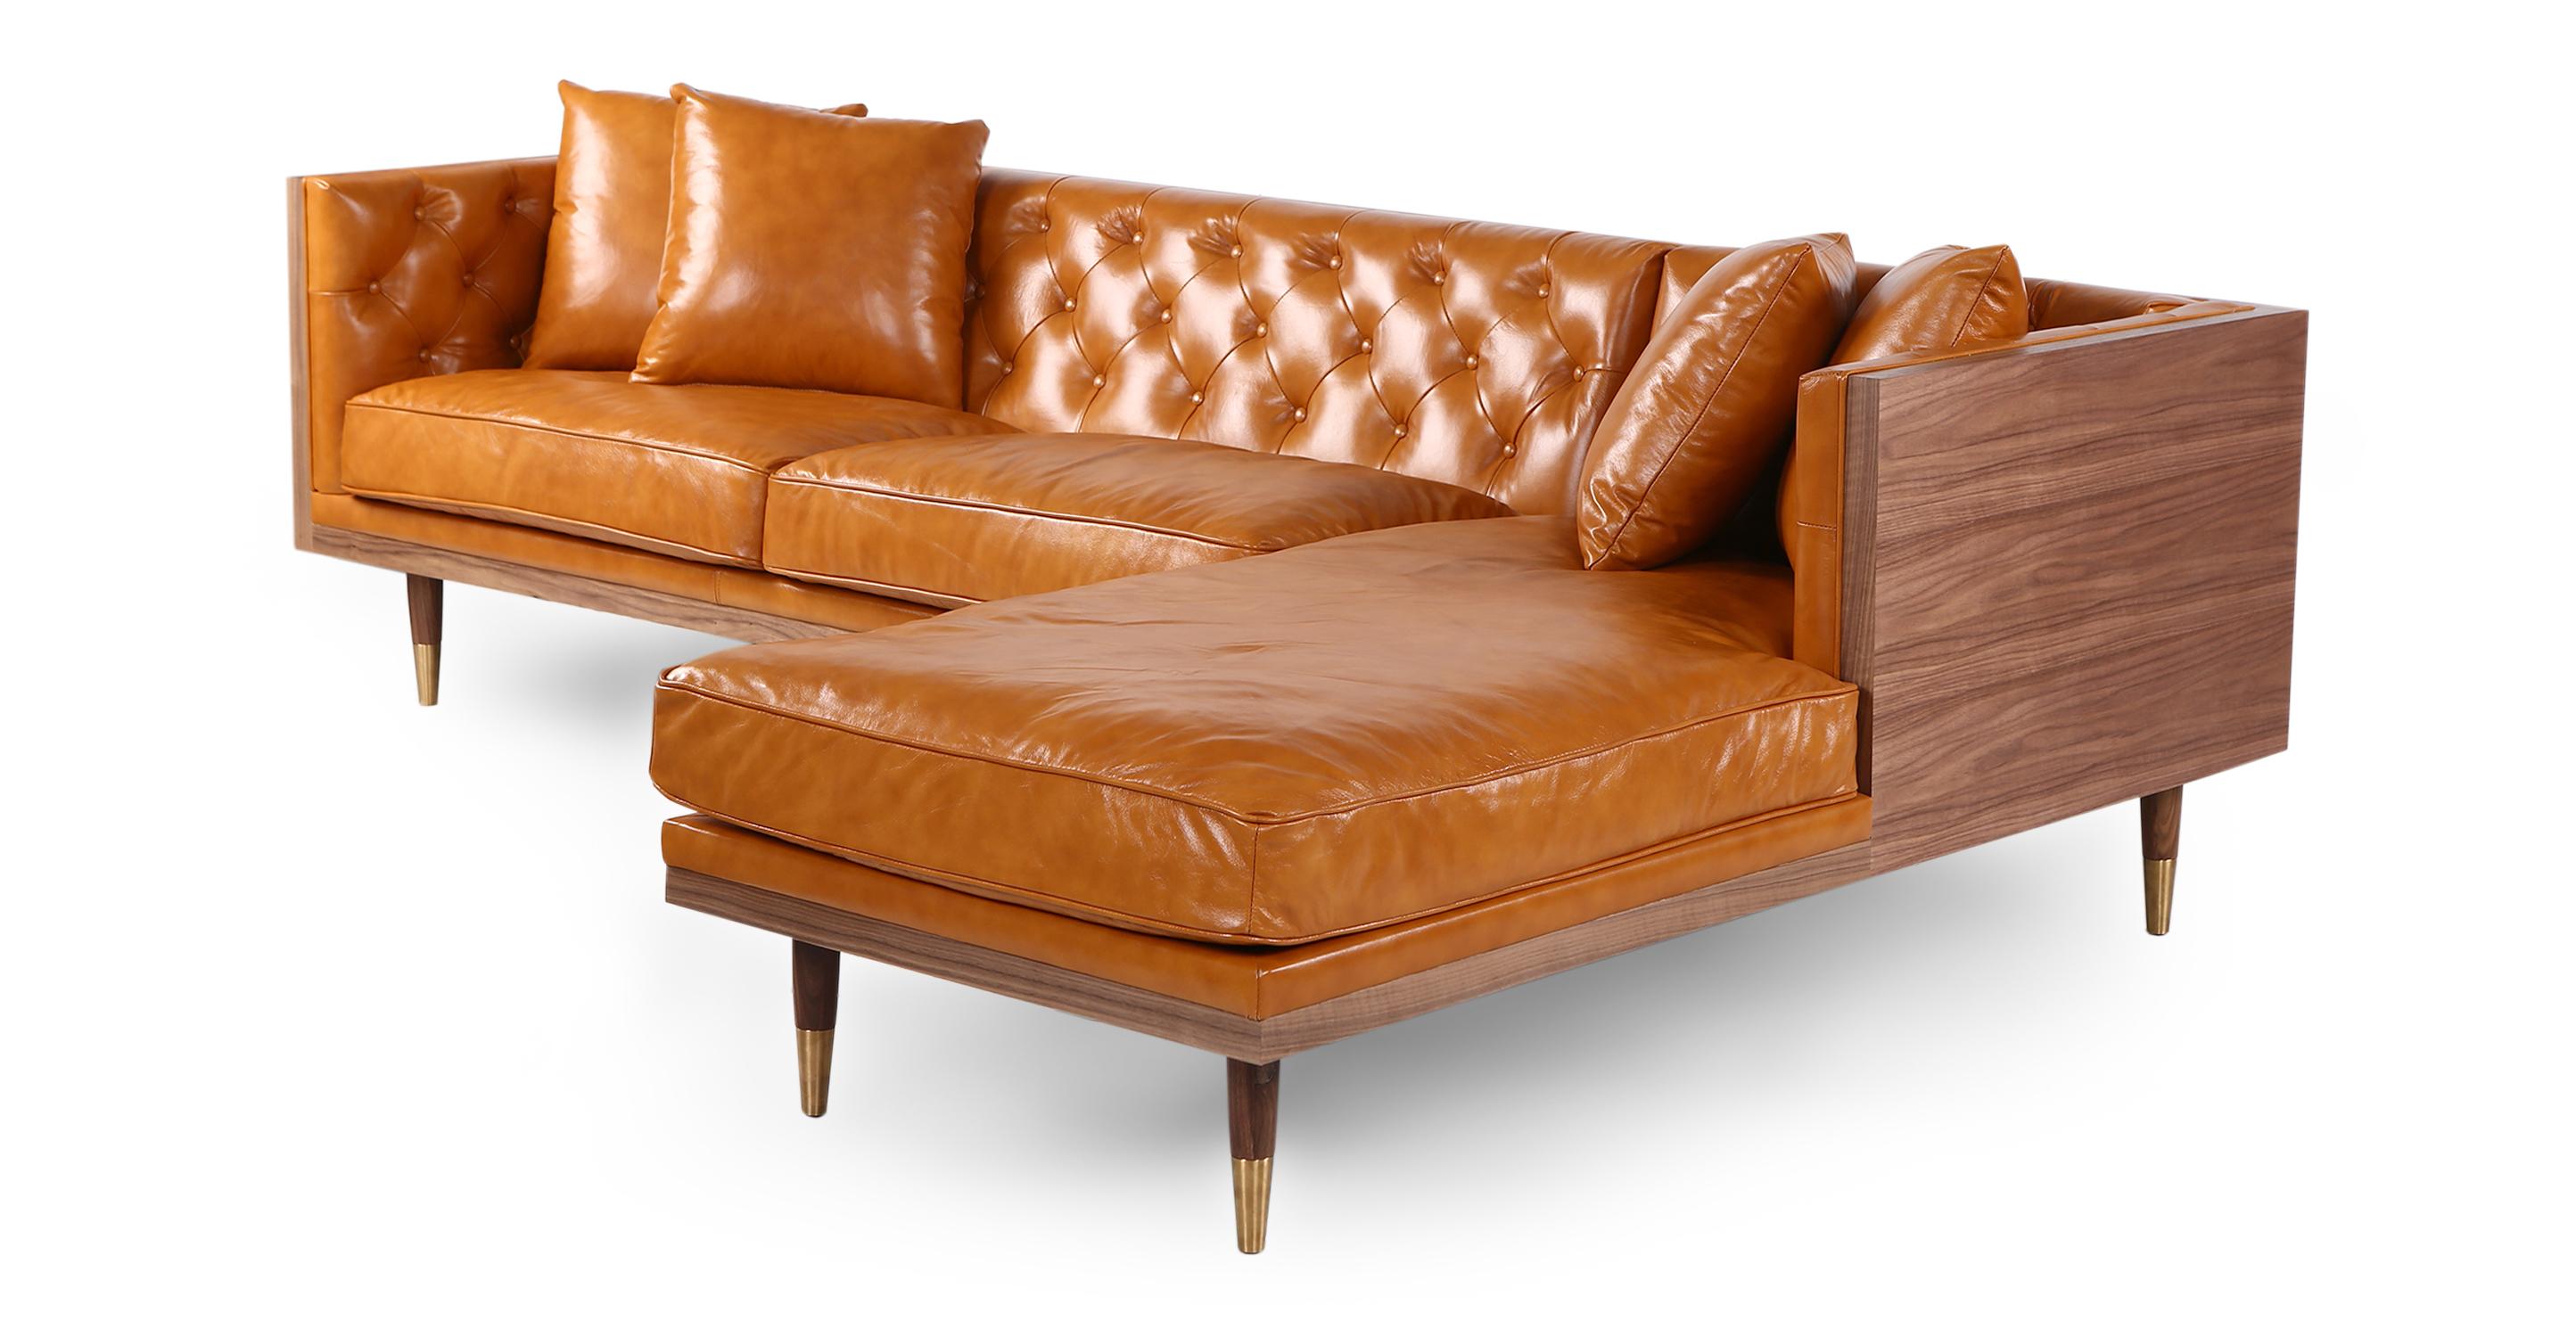 "Woodrow Neo 99"" Leather Sofa Sectional Right, Walnut/Tan Aniline"